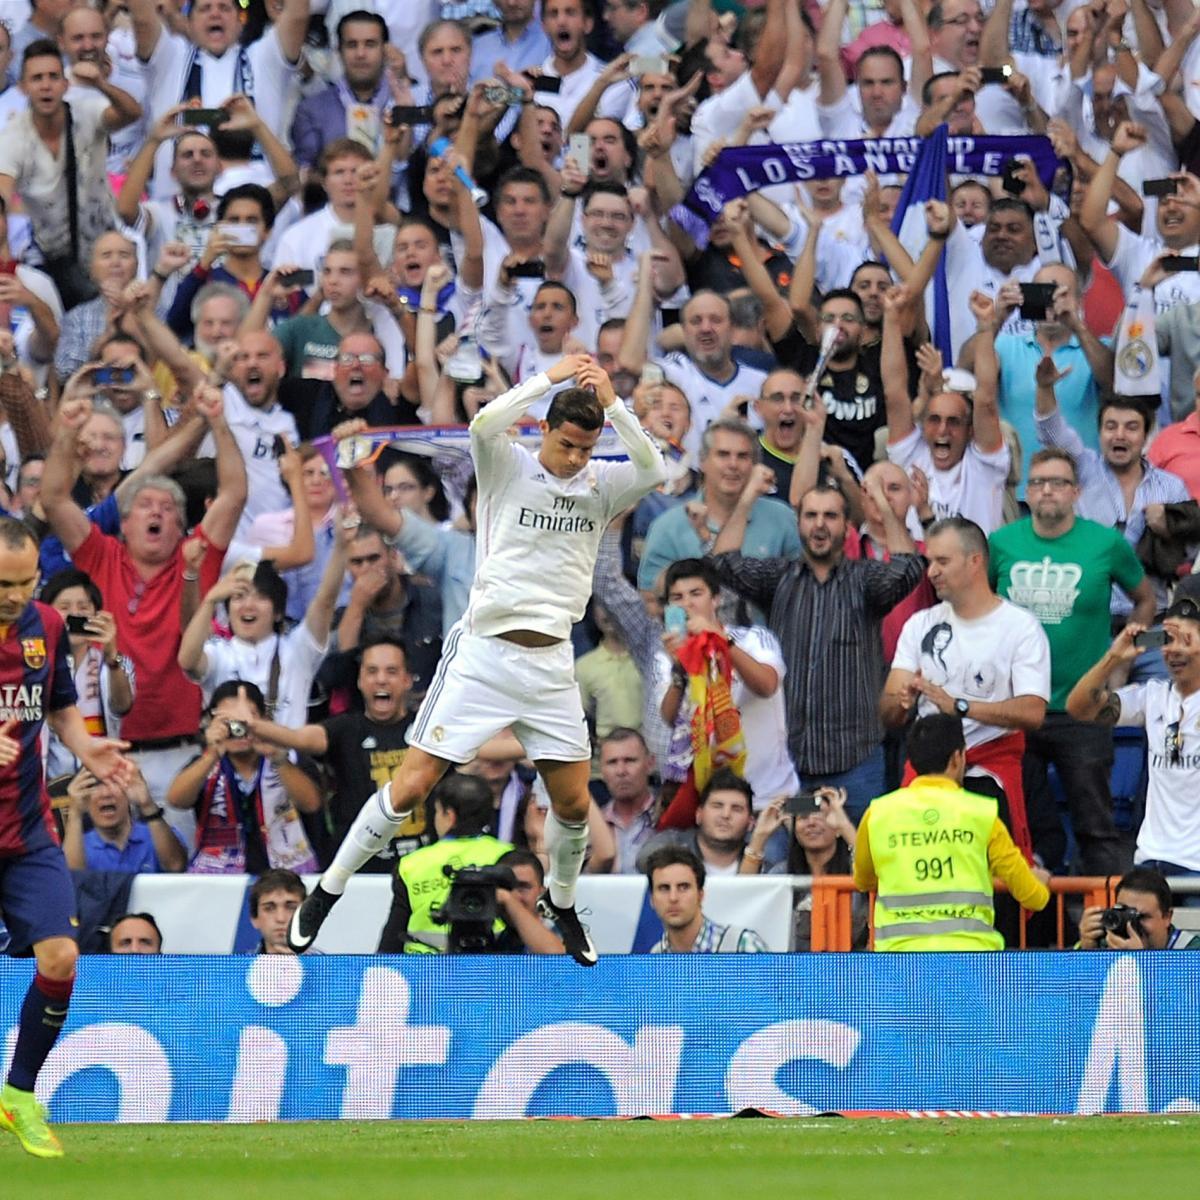 Cristiano Ronaldo S 4 Goals Lead Real Madrid To Win Vs: Twitter Reacts To Cristiano Ronaldo, Karim Benzema, James